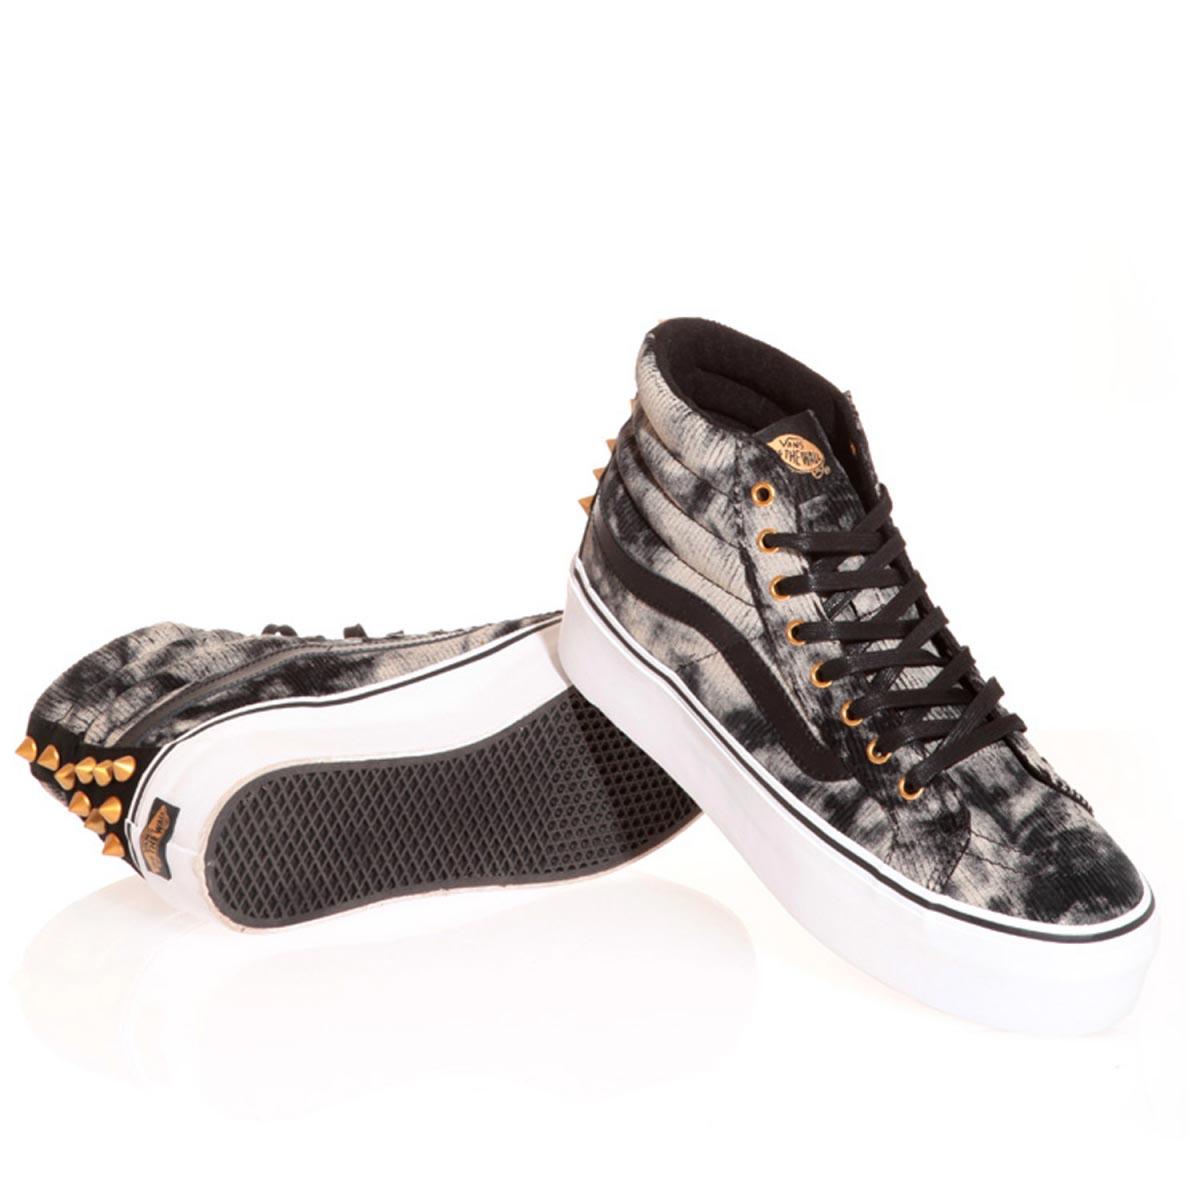 Vendita online Sk8-Hi Platform - (Studded)Blk wht - Vans - Shoes ... 1fc27871b